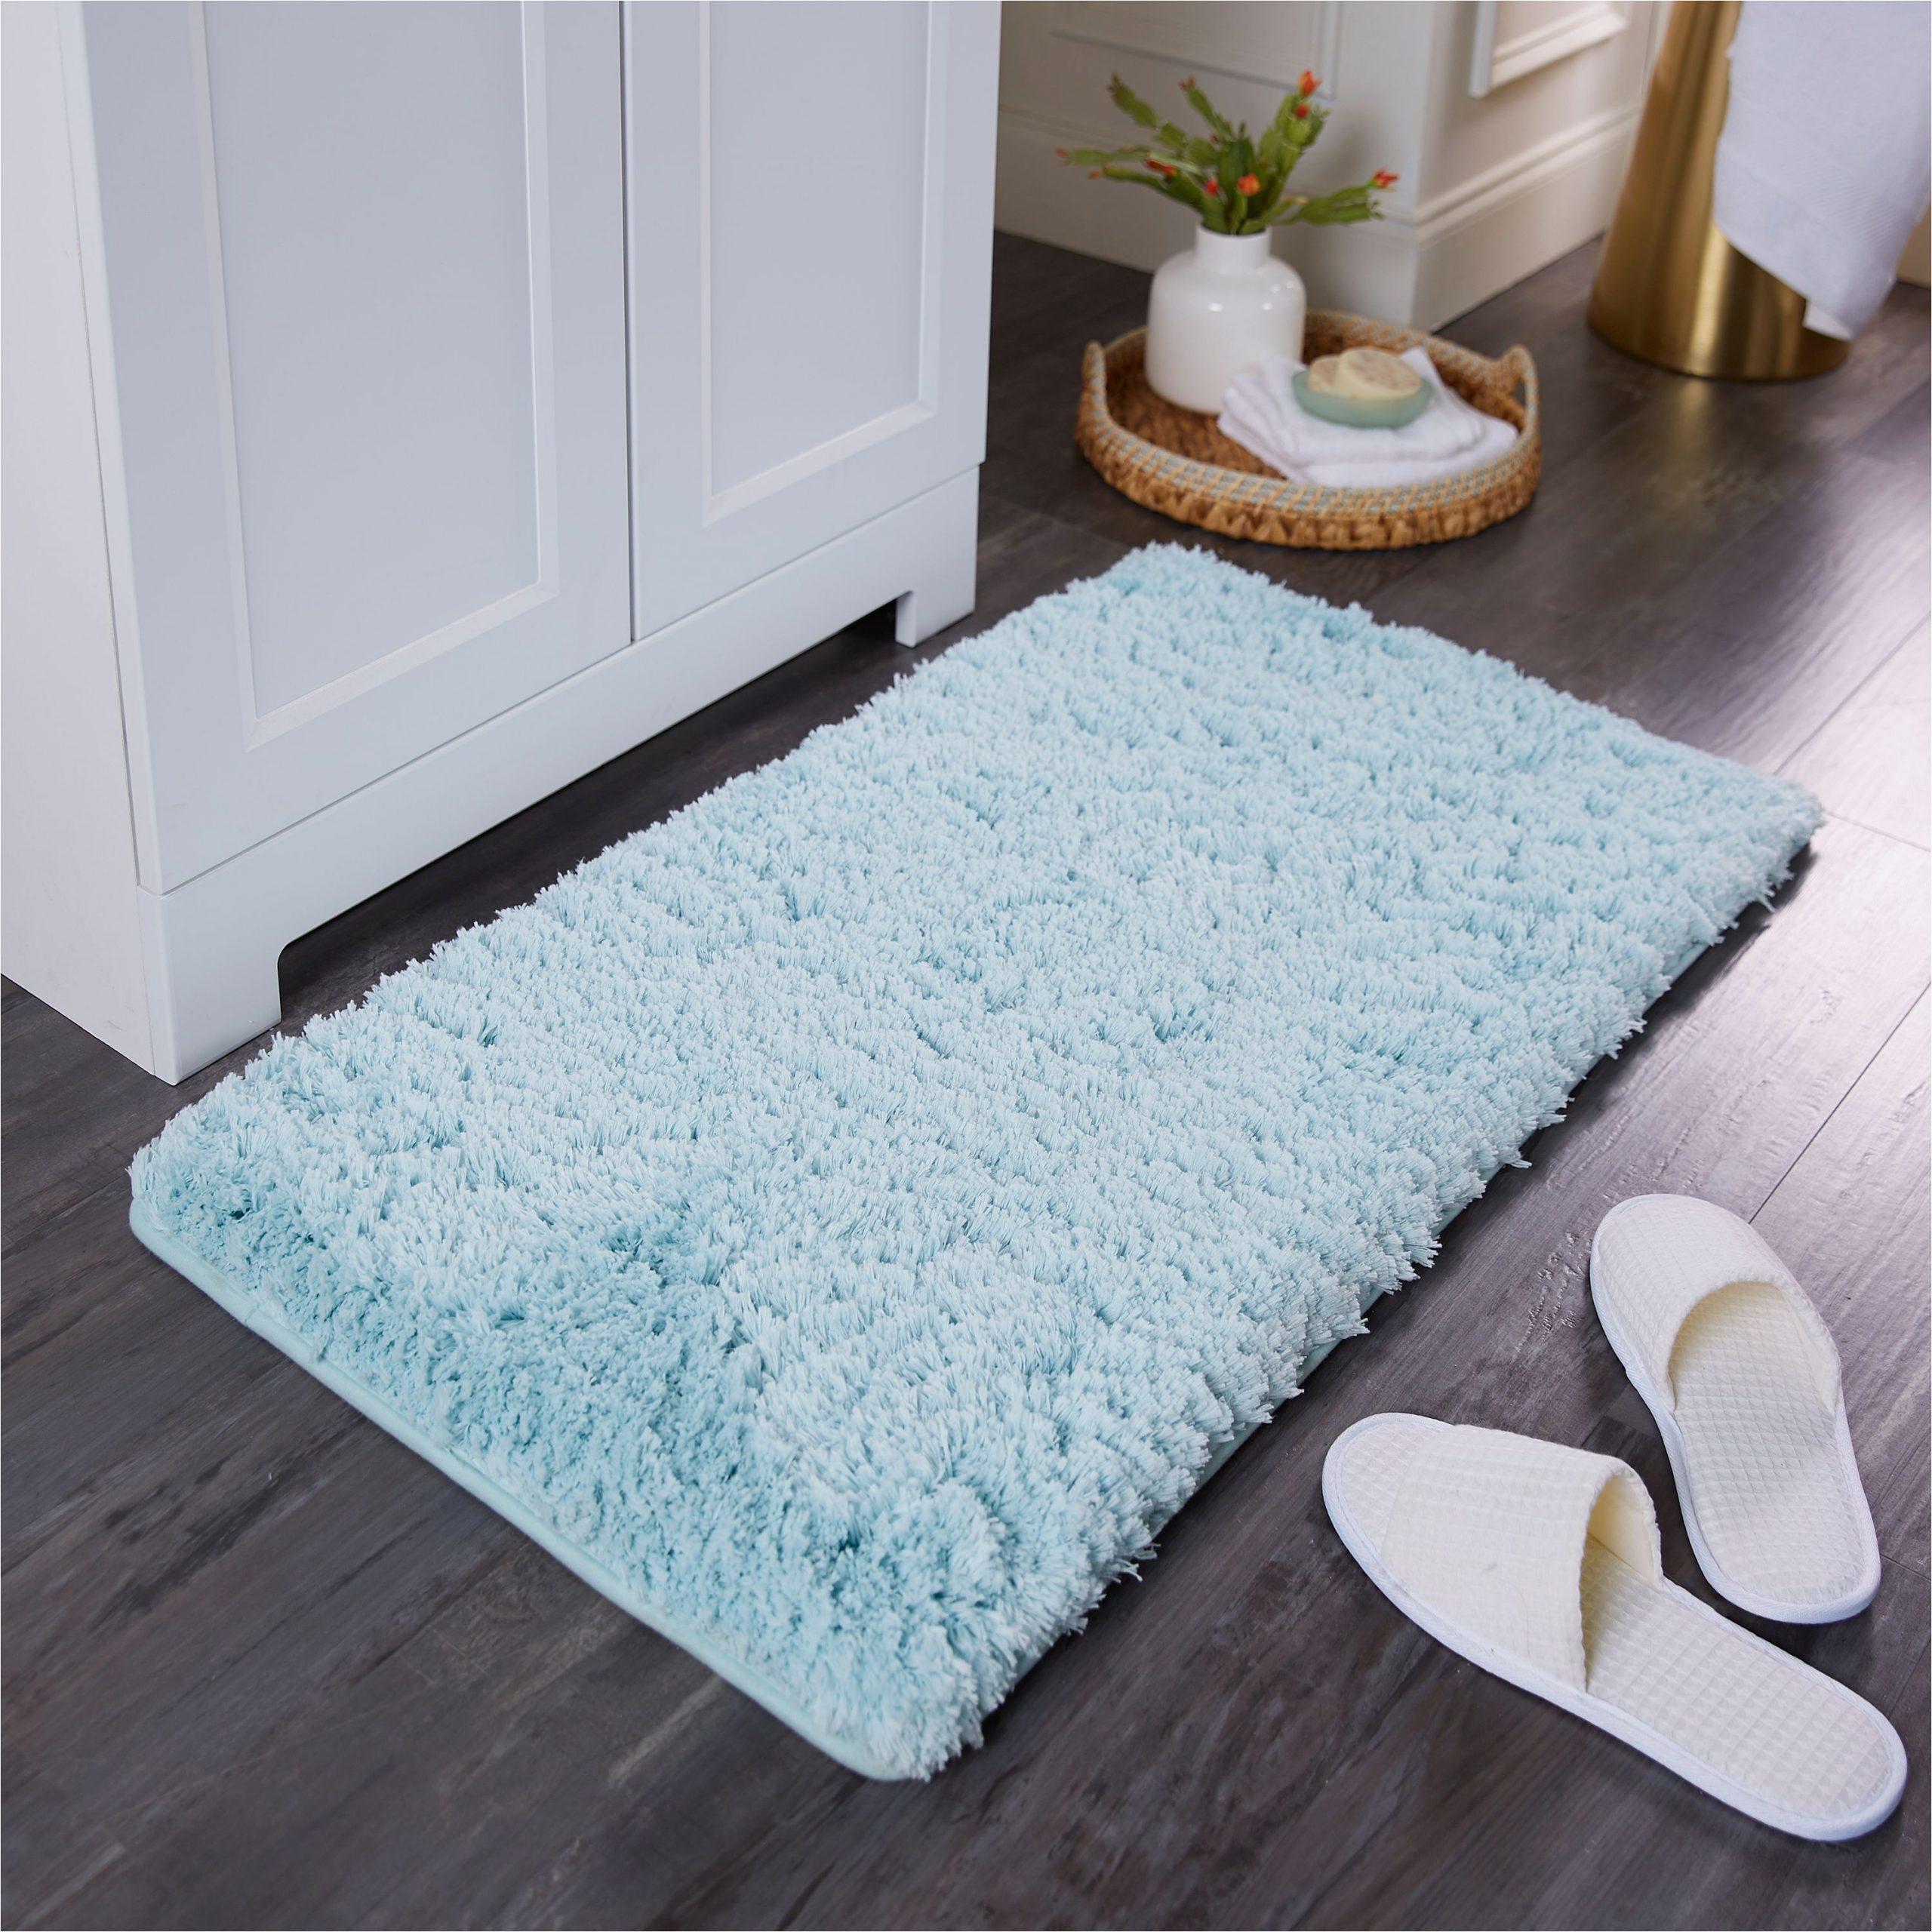 Walmart Memory Foam Bath Rugs Hotel Style Ultra Plush soft Memory Foam Bath Rug Light